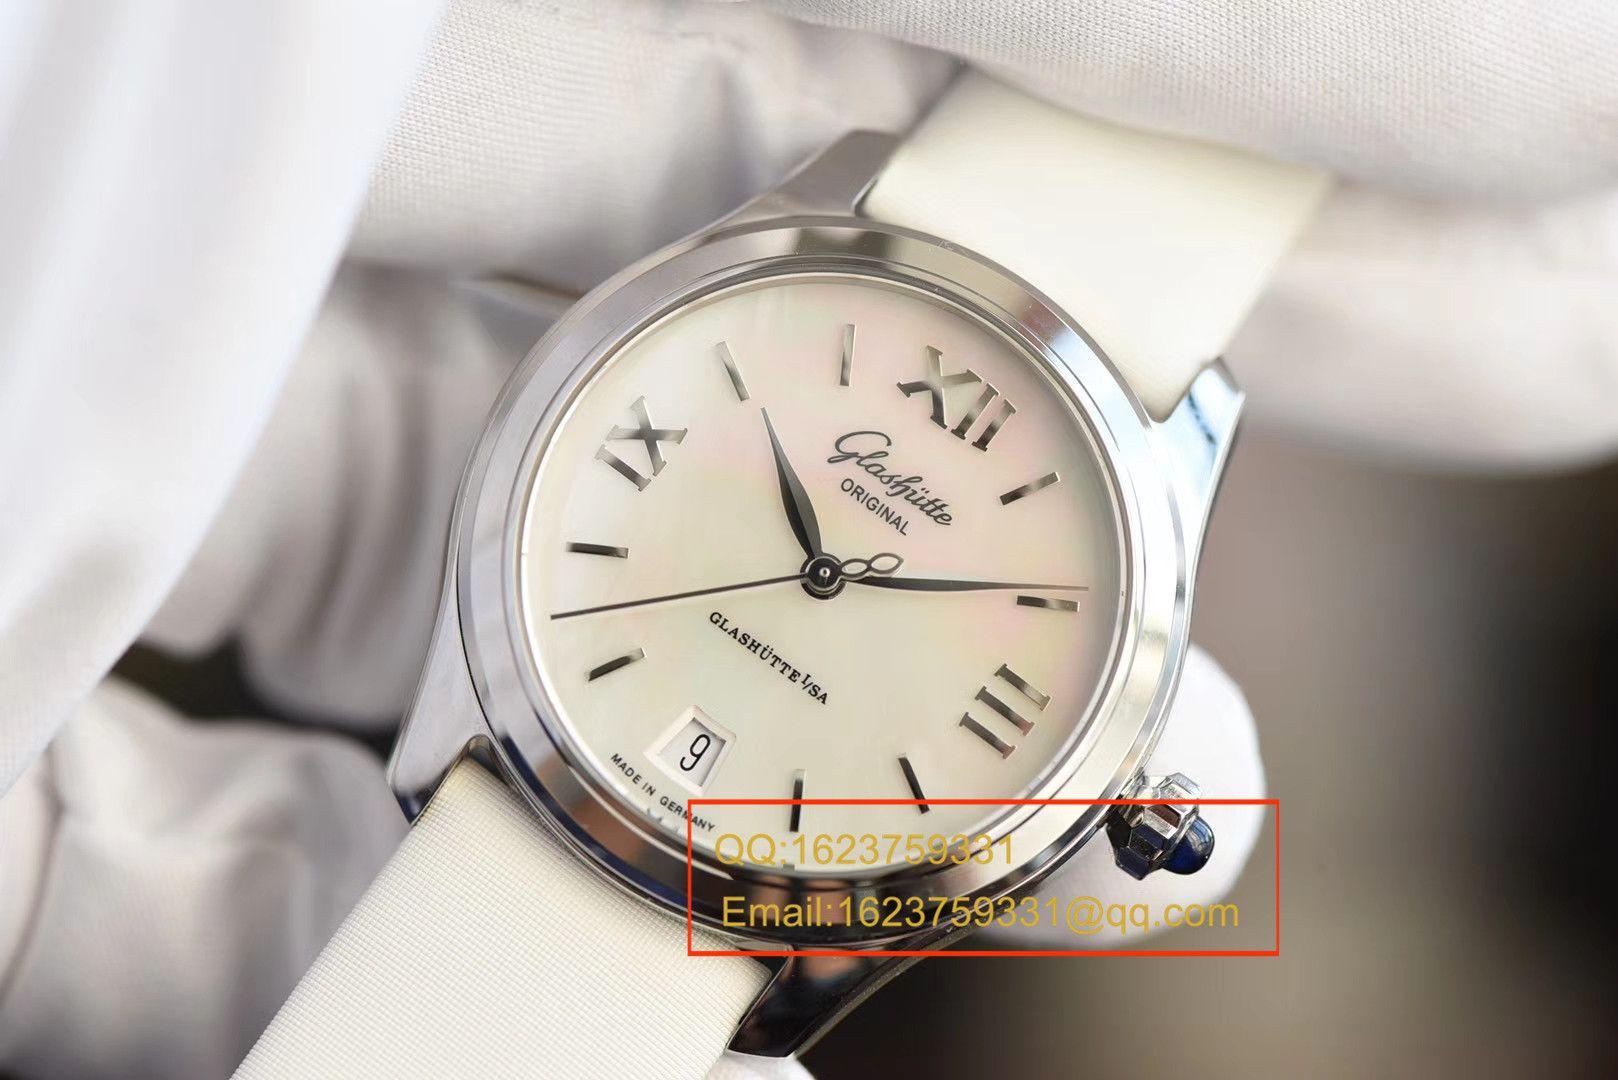 【FK一比一超A高仿手表】格拉苏蒂原创女表系列39-22-08-02-44女士腕表 / GLA045